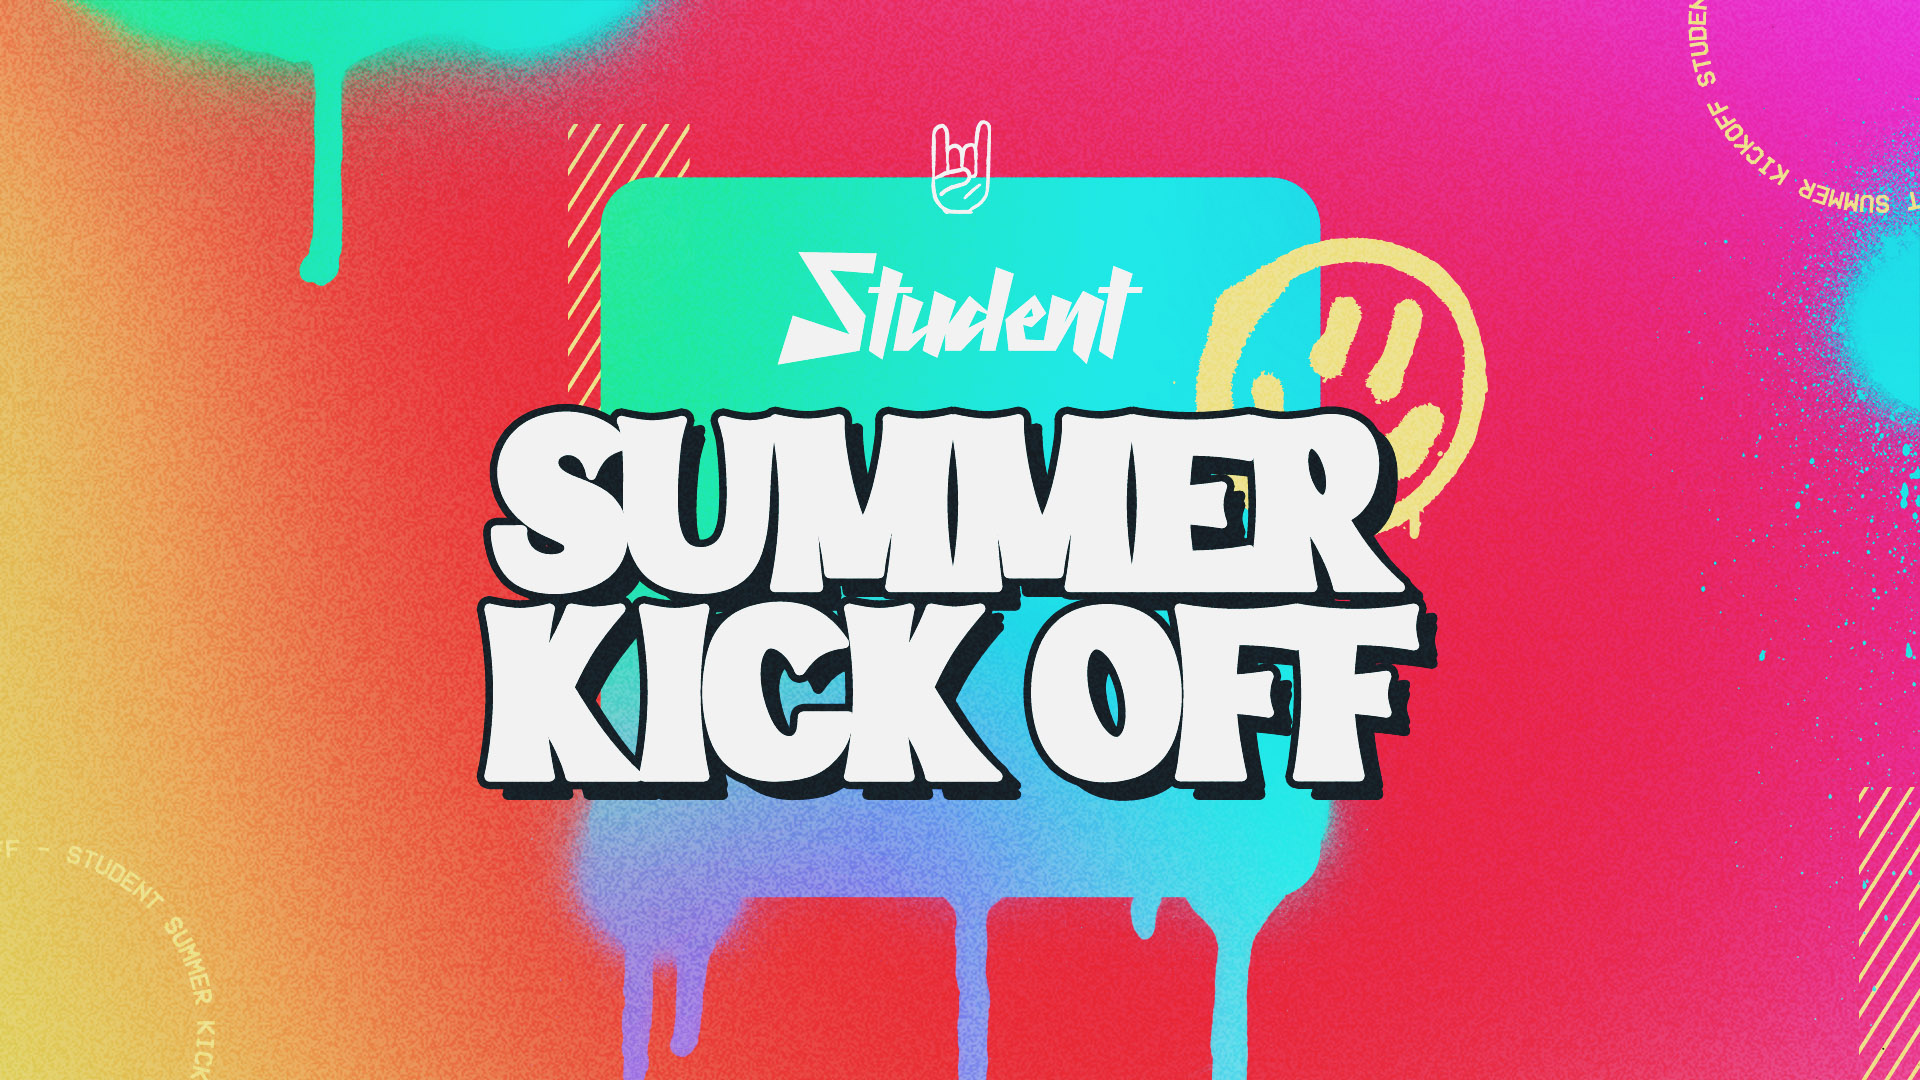 Student Summer Kick Off - 1920x1080